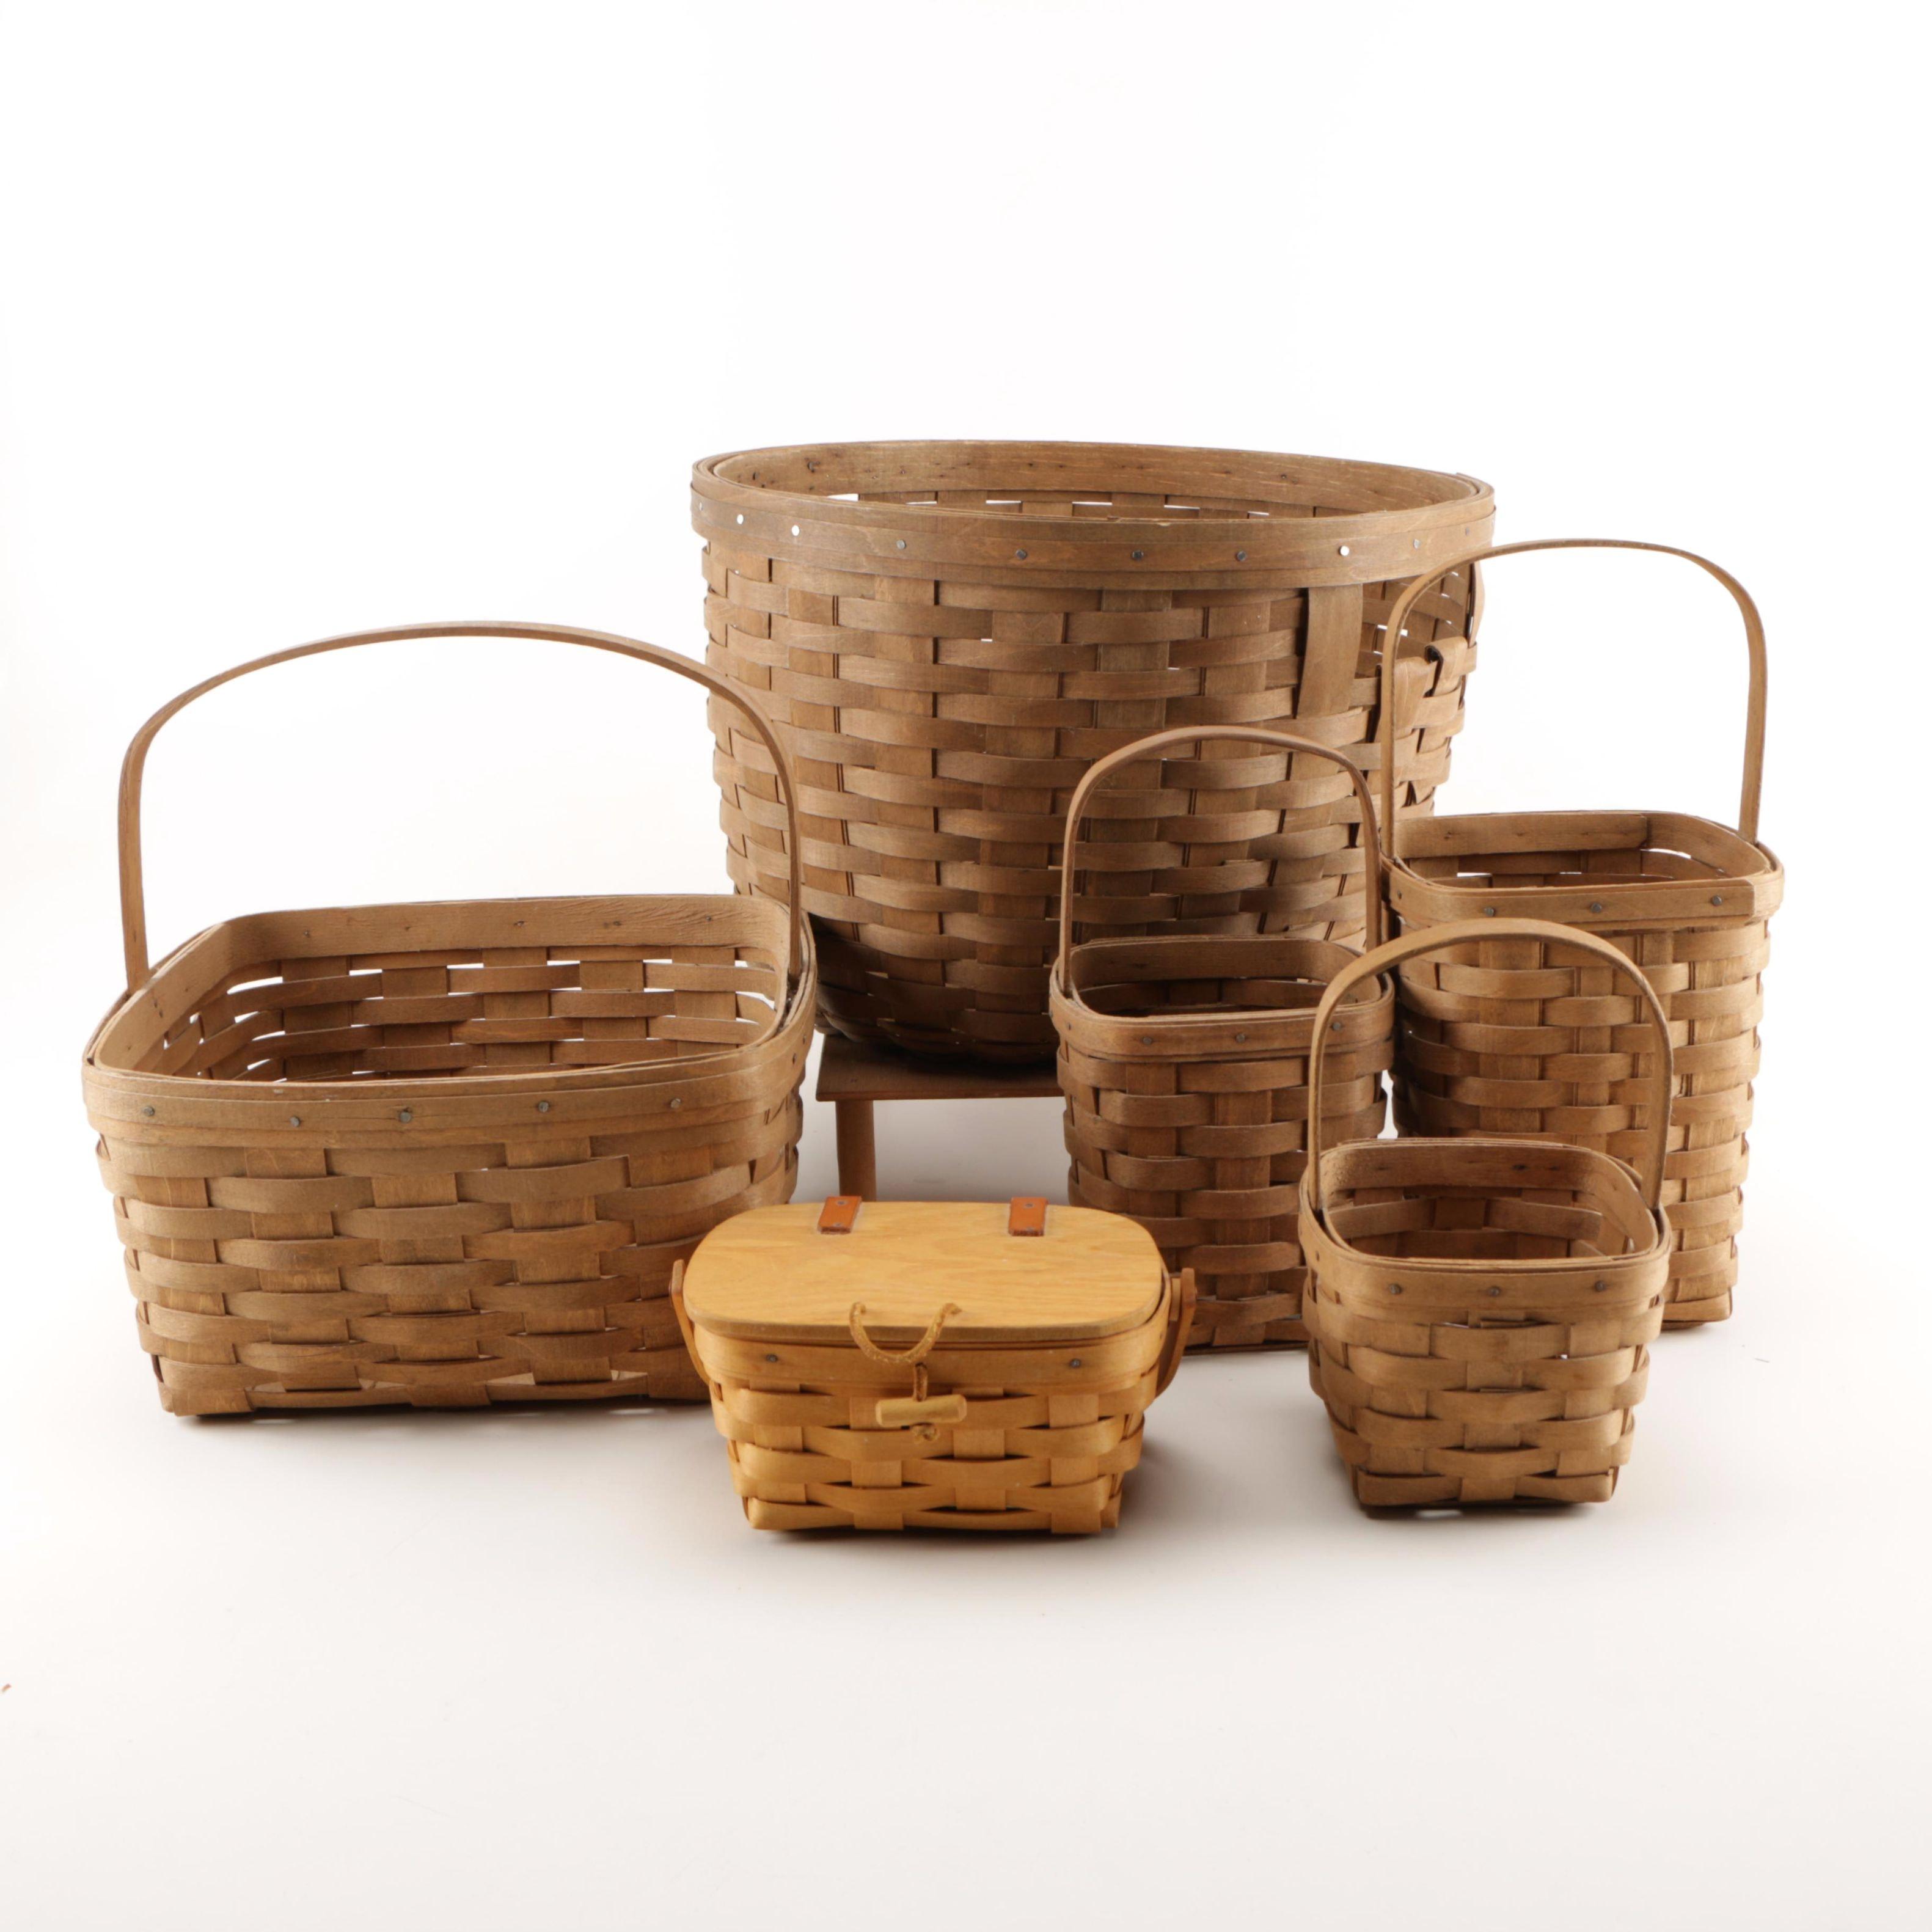 Longaberger Handwoven Baskets